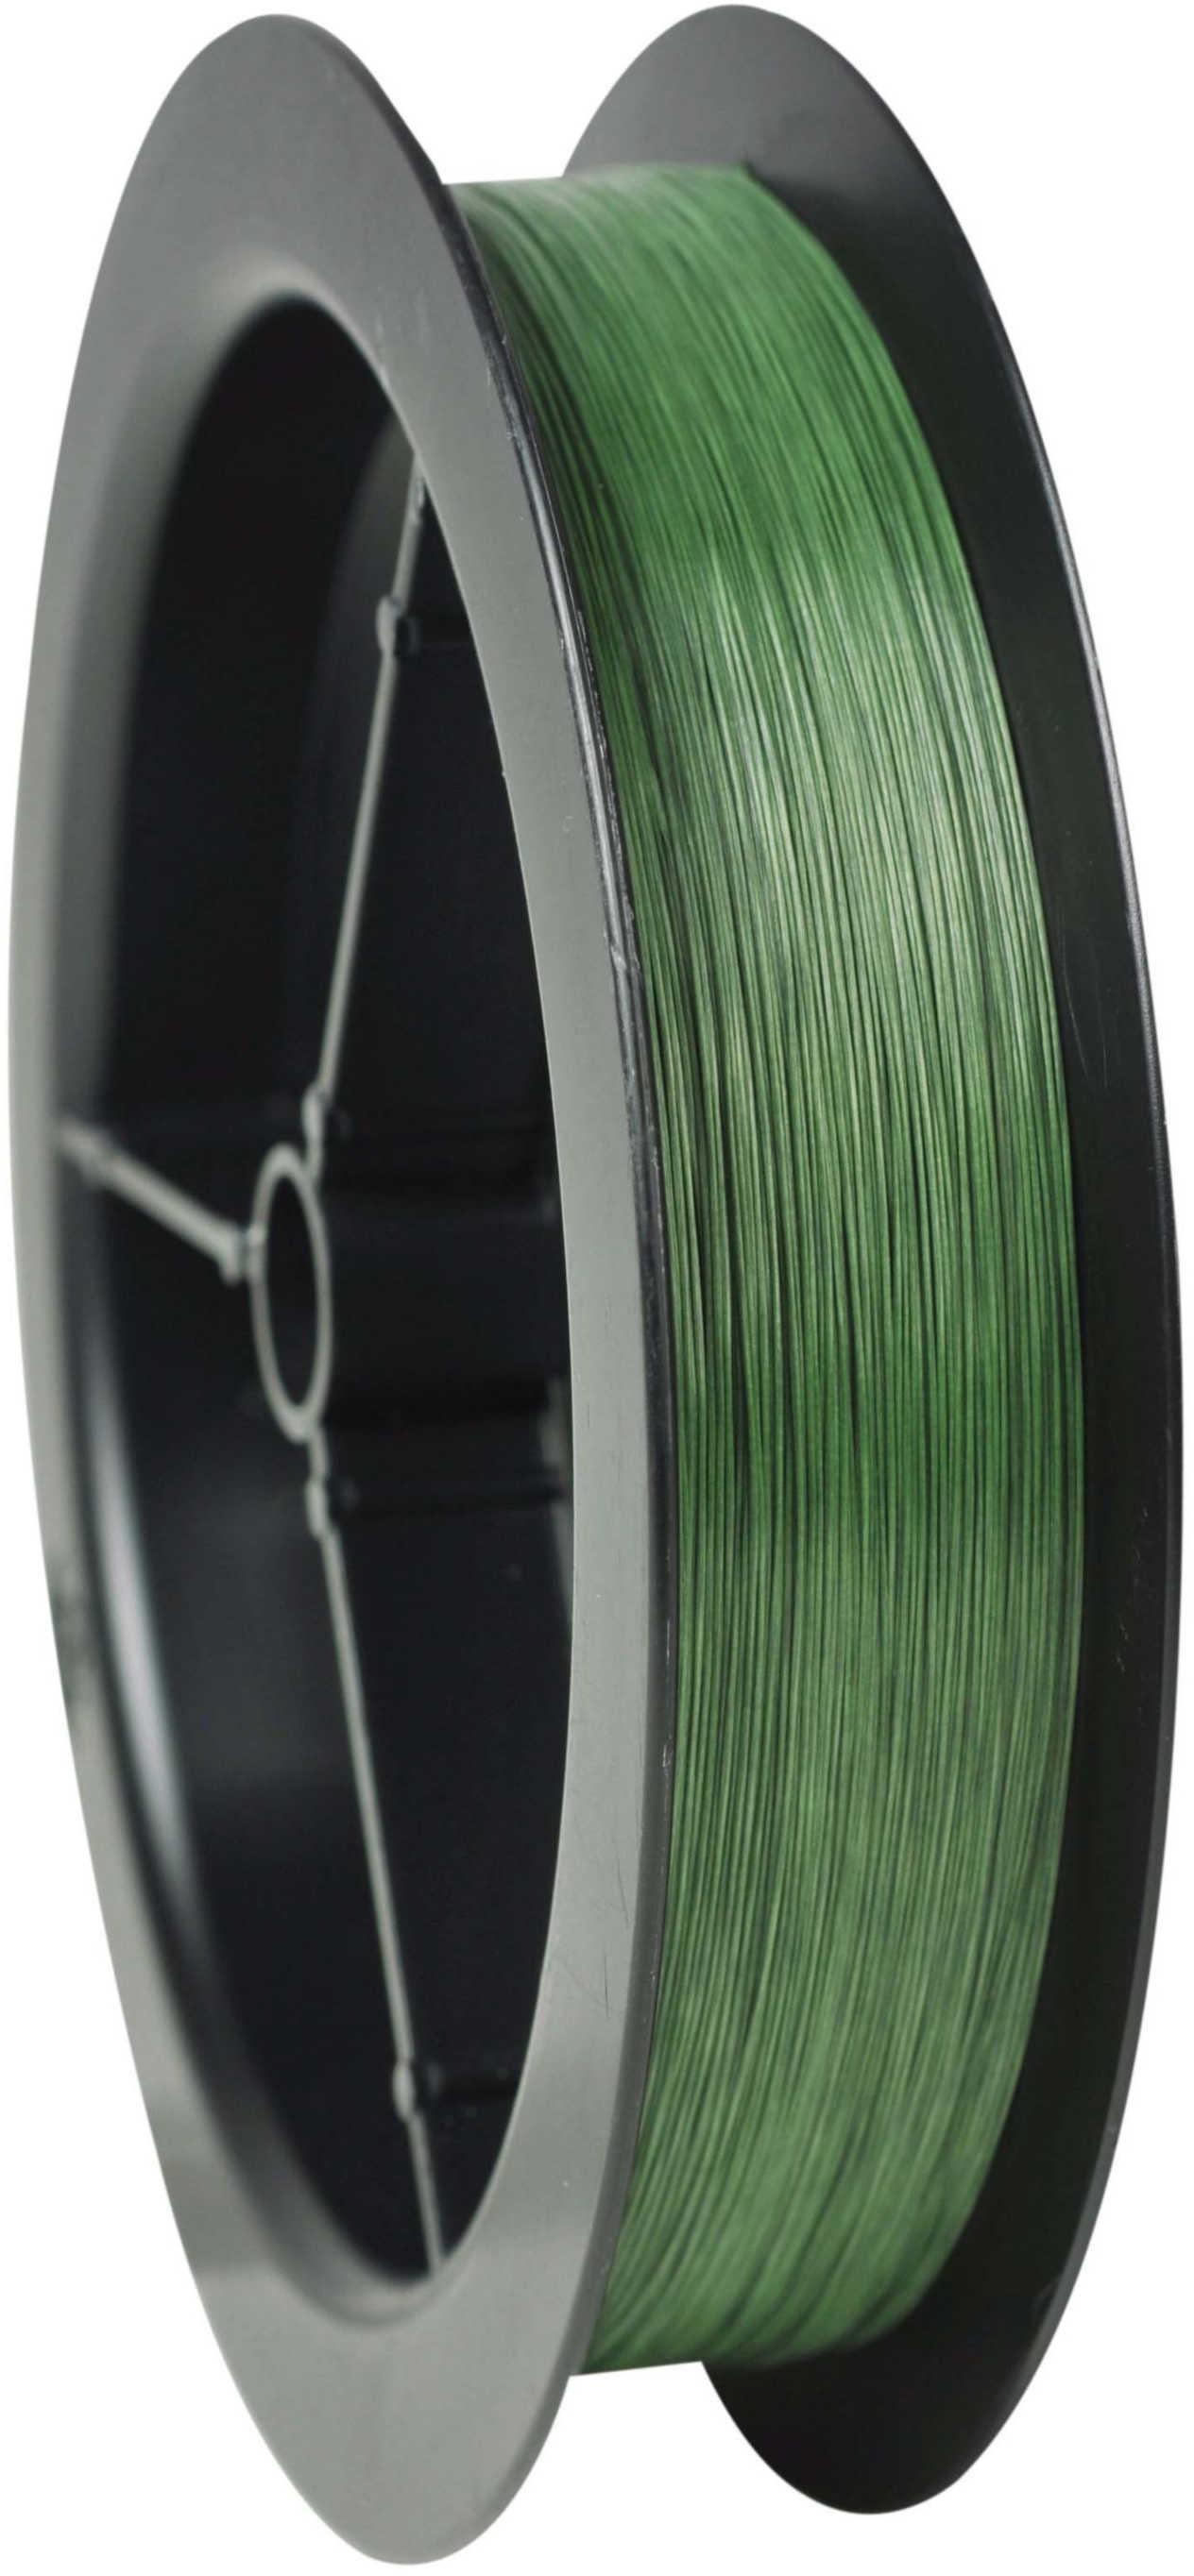 Pure Fishing / Jarden Spiderwire Ez Braid 110yd 50#/12Dia Moss Green Md#: EZB50G-110